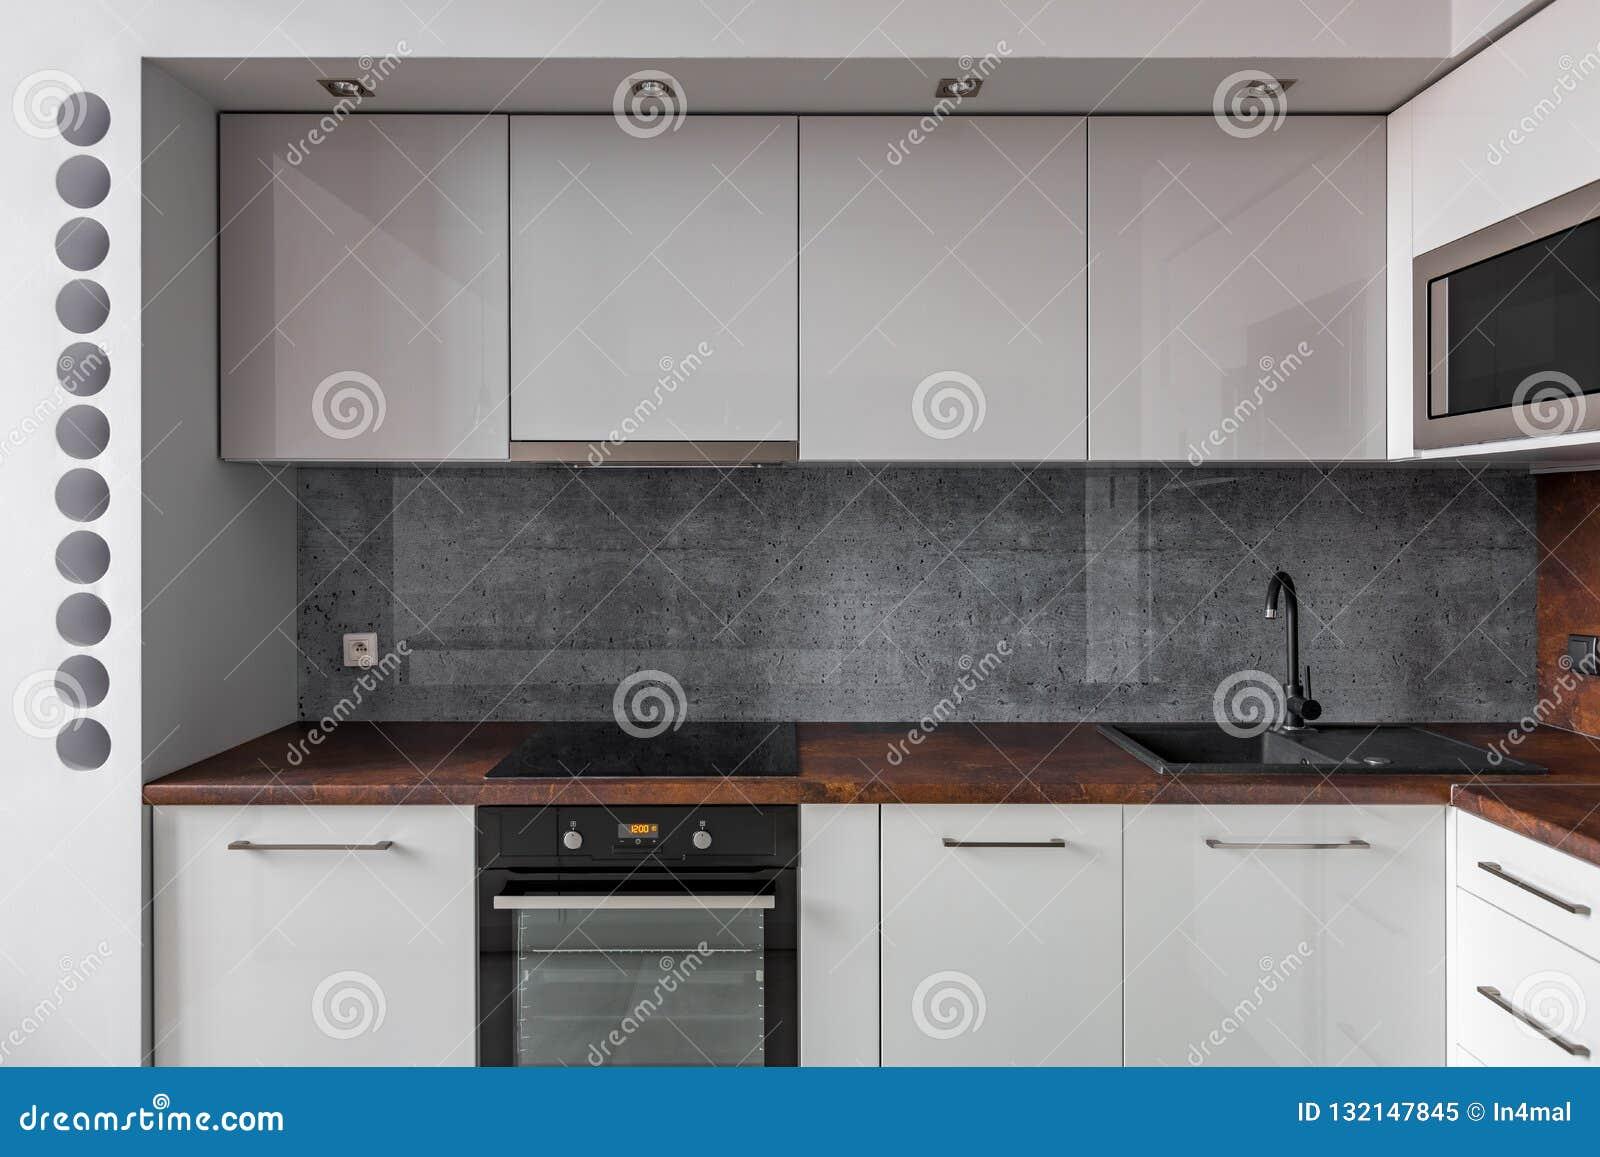 Modern Kitchen With Gray Backsplash Stock Image Image Of Granite Interior 132147845